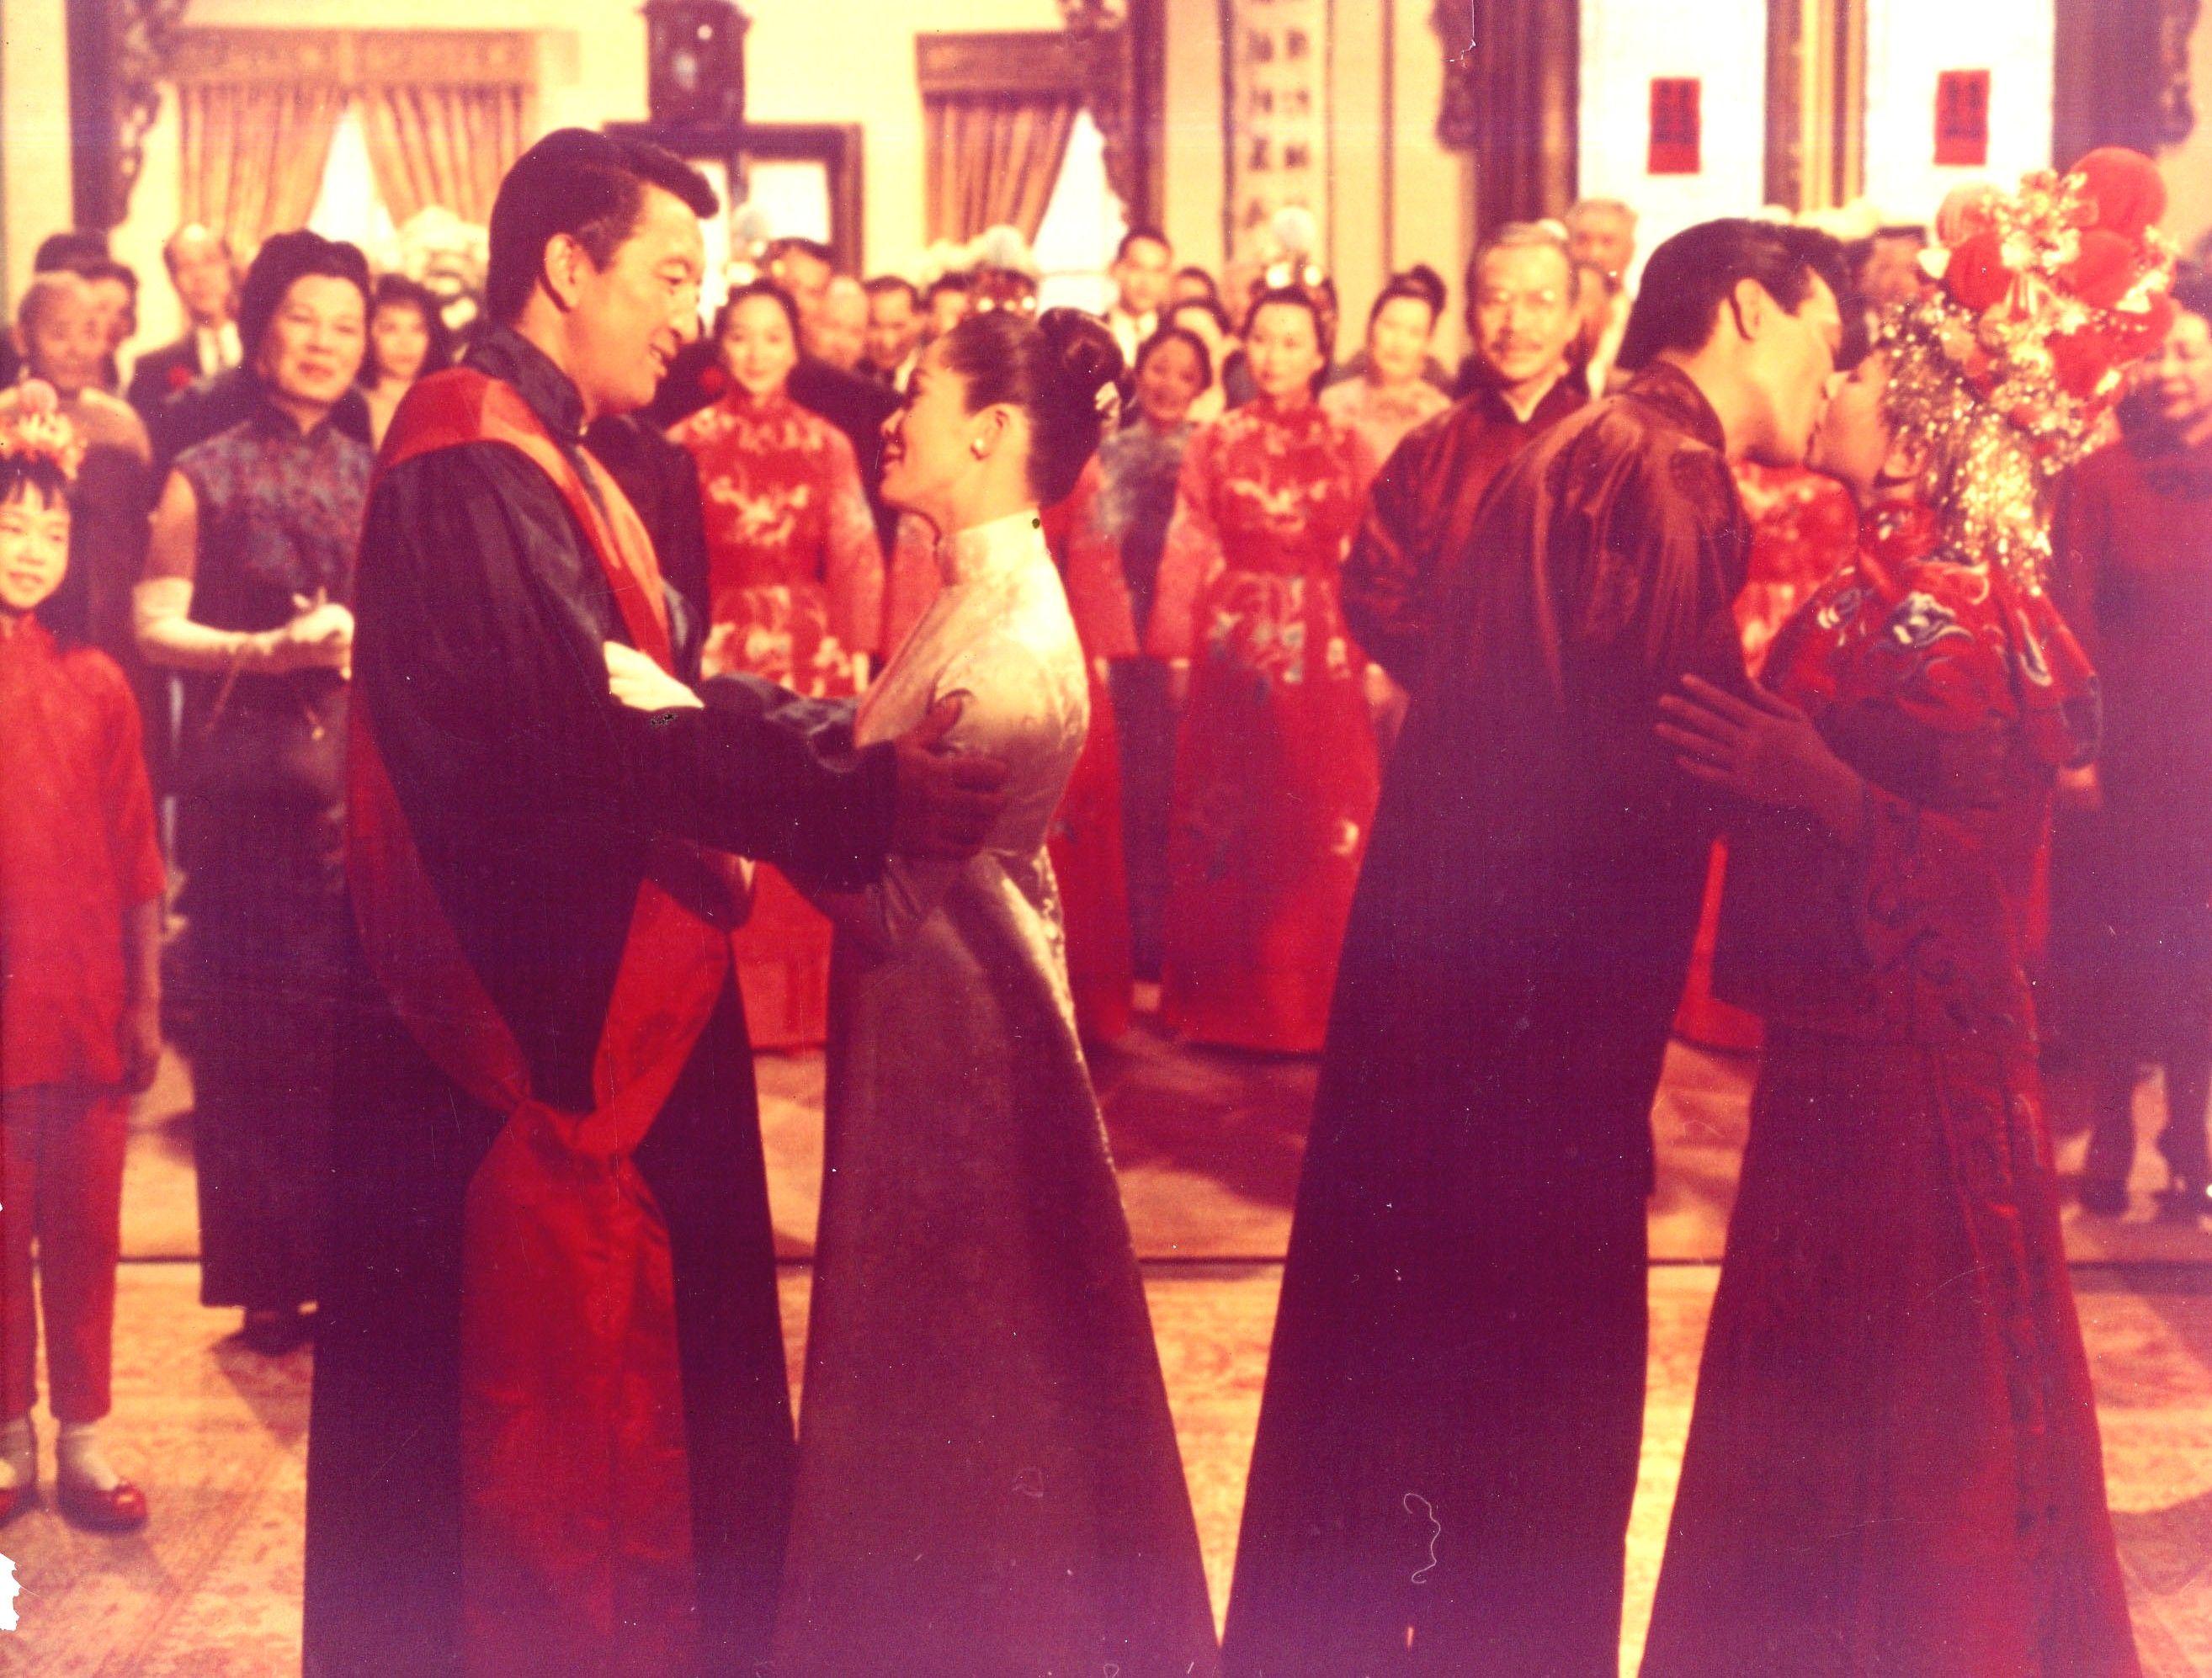 'Die Hard' and 'The Crimson Kimono' Actor James Shigeta